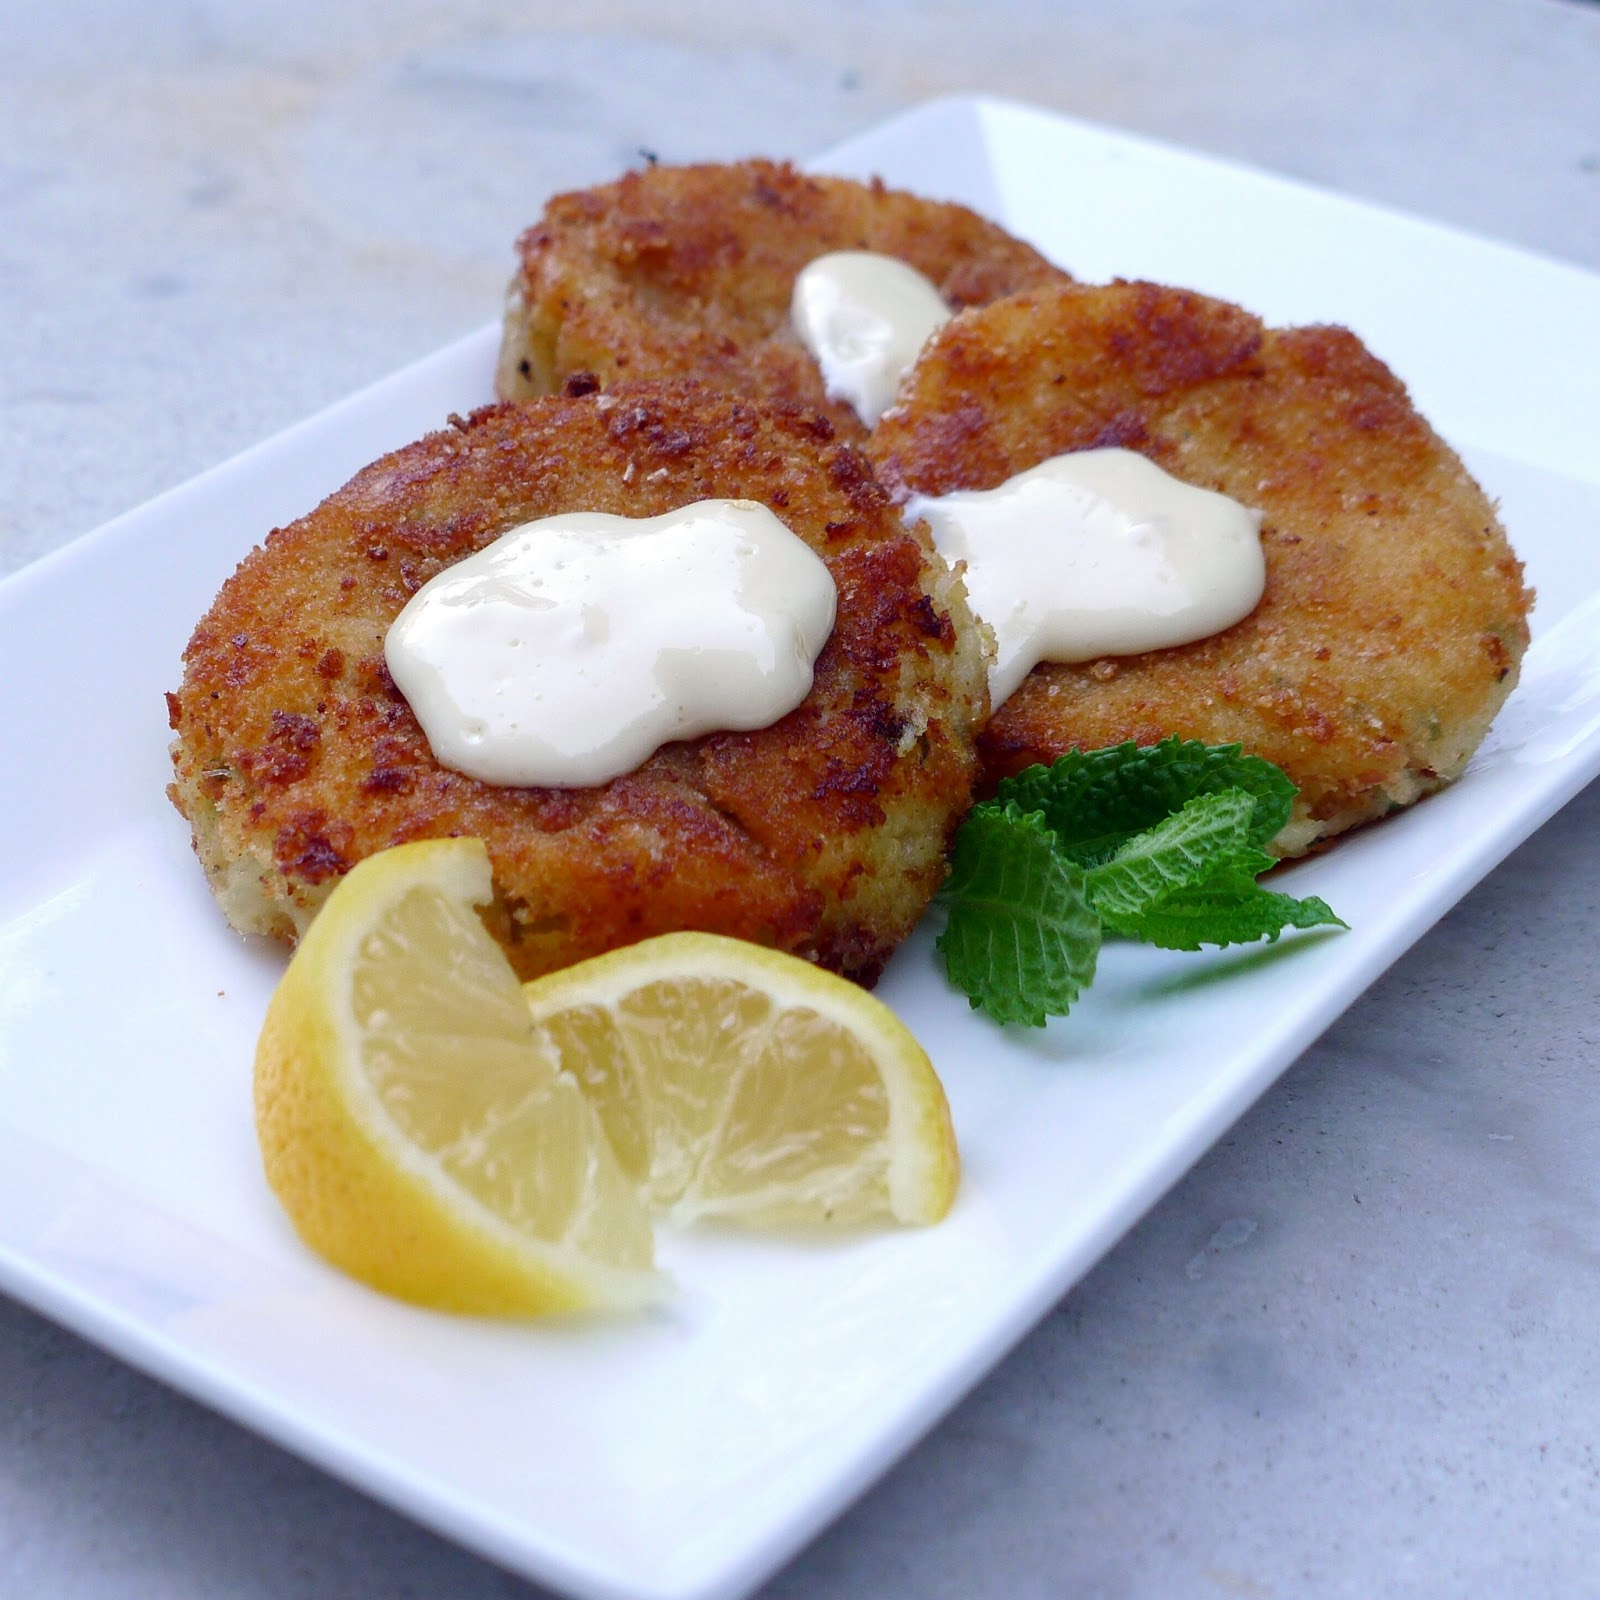 cod fish cakes thornews portuguese cod fish cakes cod fish cakes ...